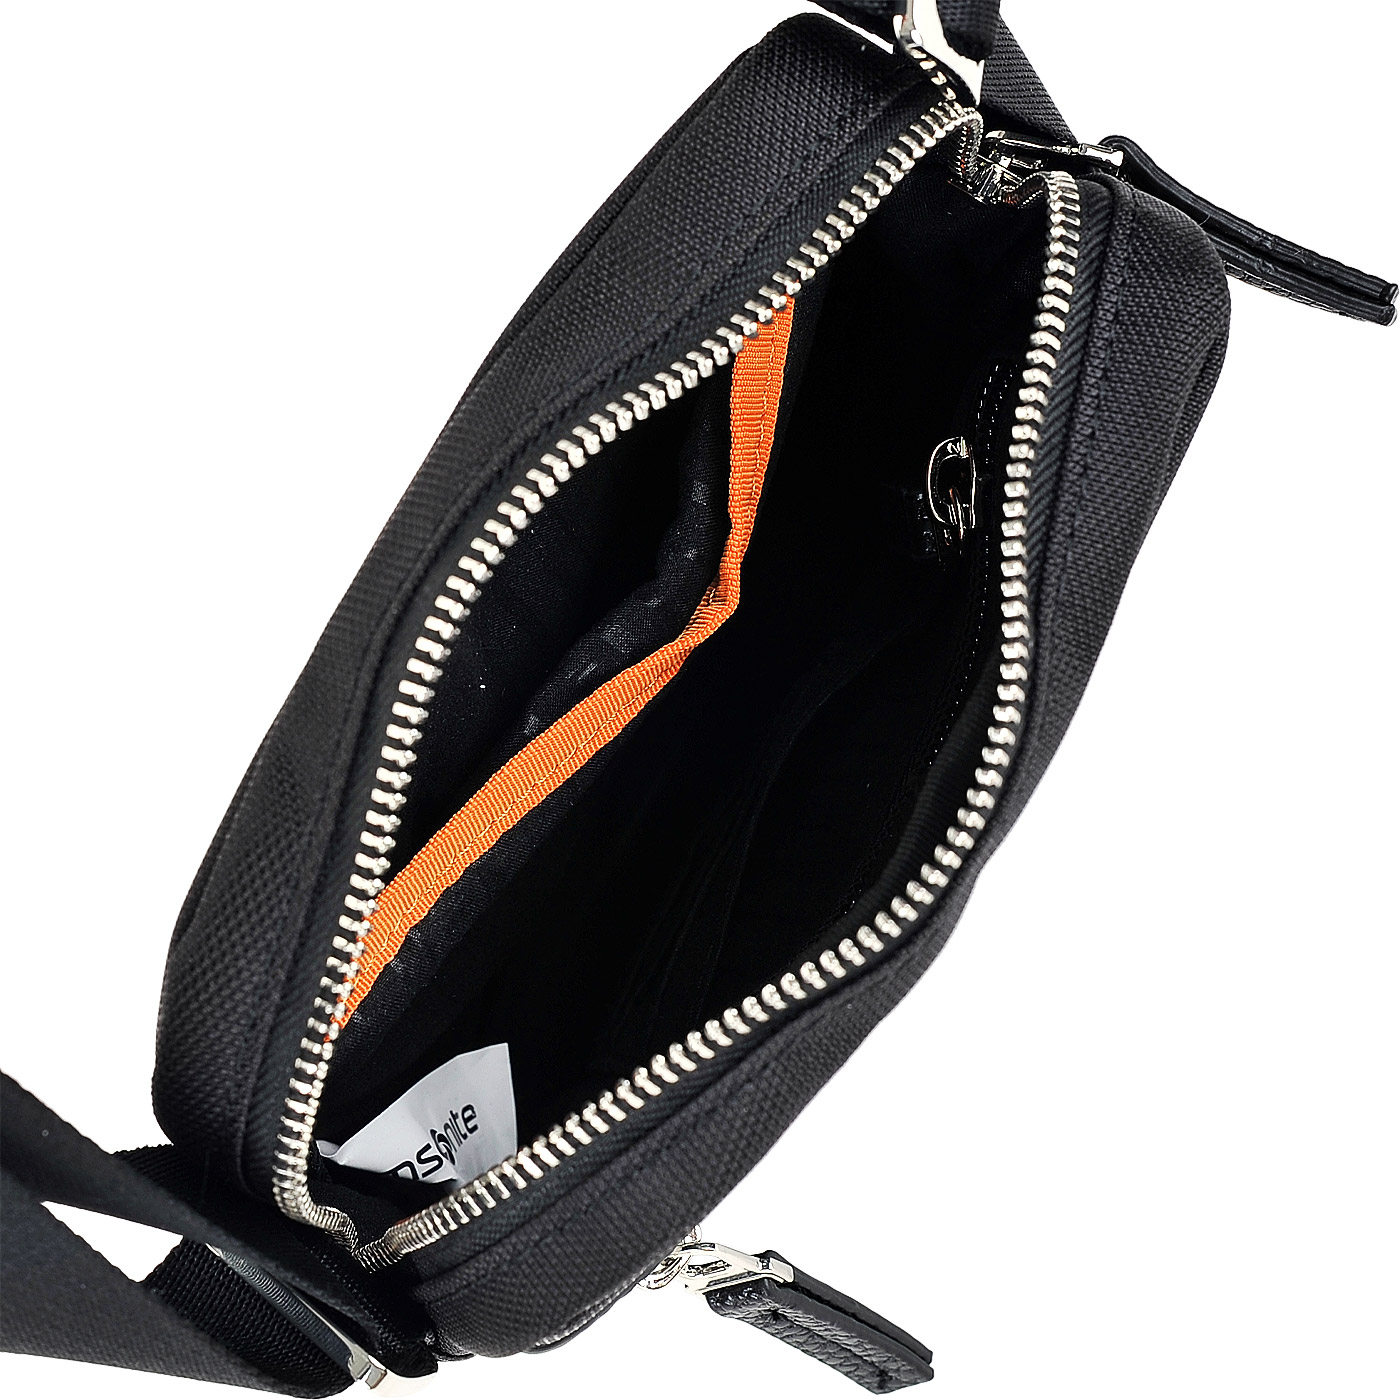 94d576d039b2 ... Практичная текстильная сумка через плечо Samsonite Hip-Class ...